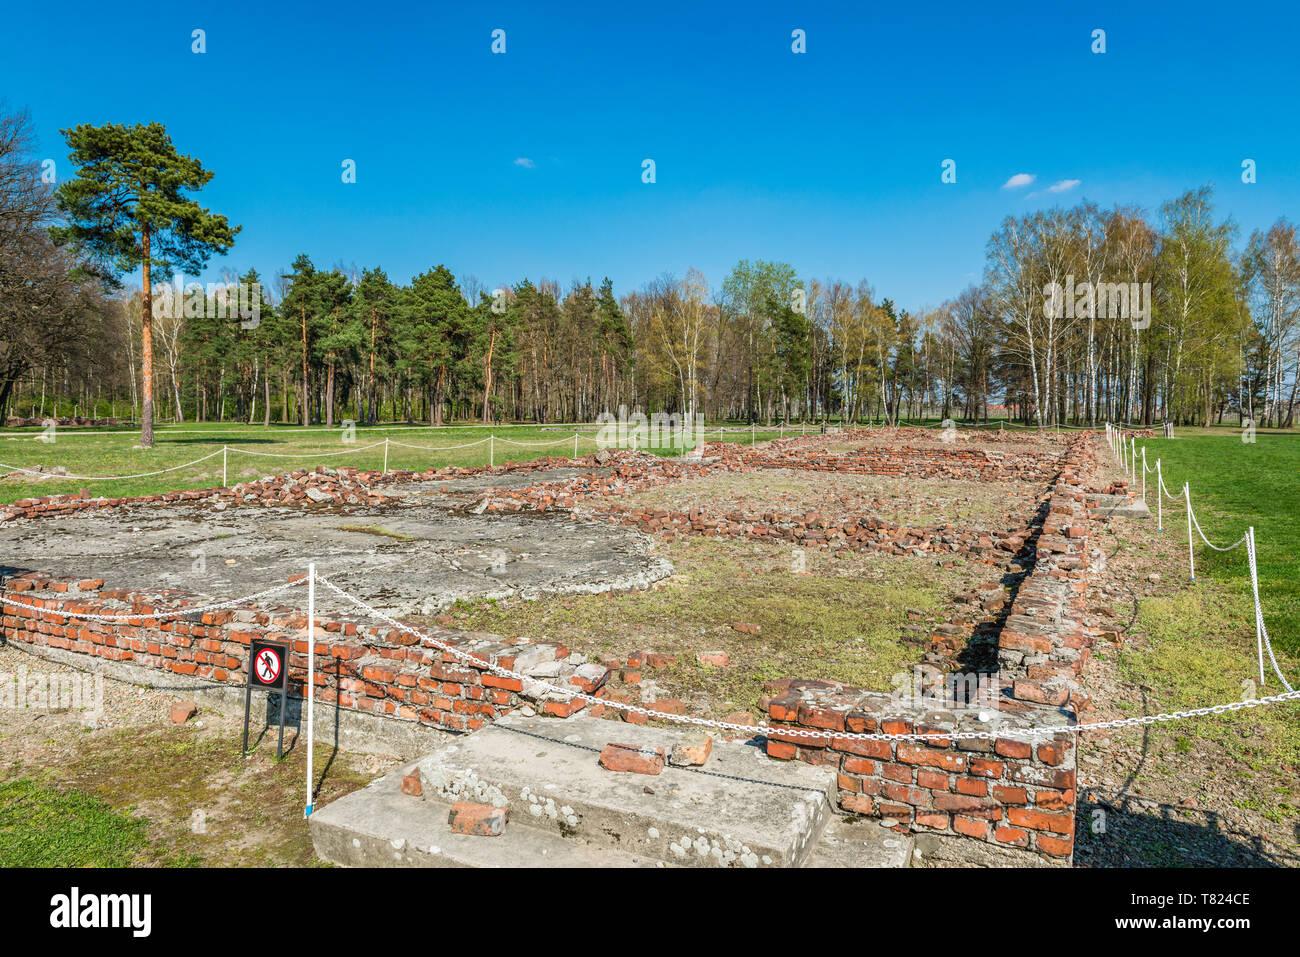 AUSCHWITZ (OSWIECIM), POLAND - APRIL 18, 2019: Ruins of Gas Chamber in Auschwitz Birkenau extermination camp, Poland - Stock Image